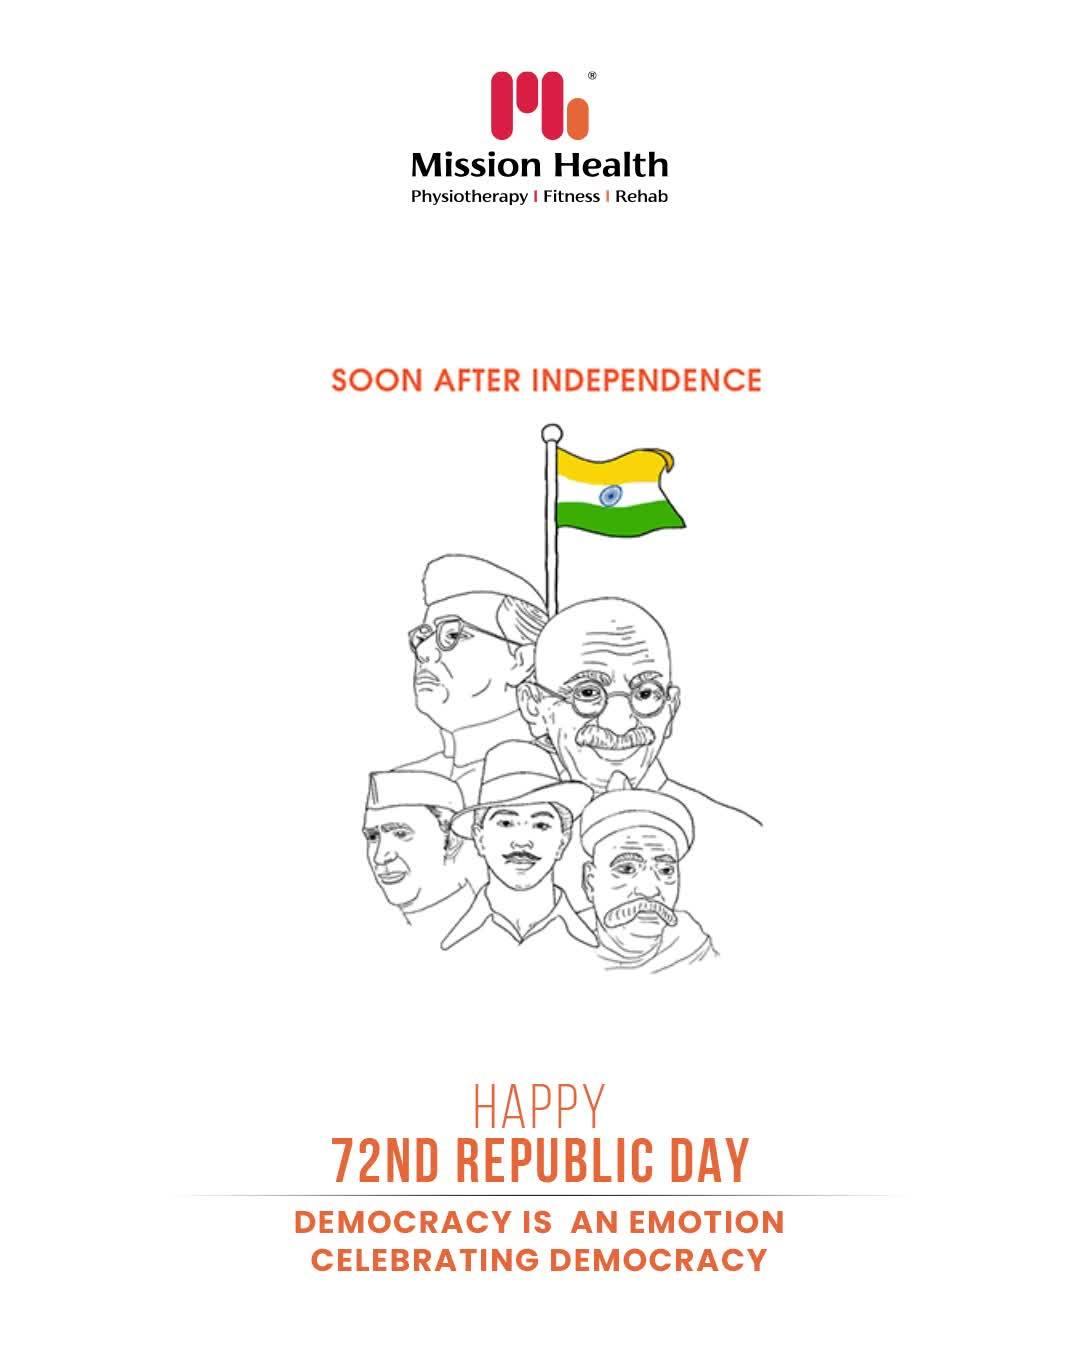 Happy Republic Day!  #HappyRepublicDay #RepublicDayIndia #RepublicDay2021 #India #JaiHind #MissionHealth #Fitness #PersonalTraining #FatToFit #Transform #GroupFitness #Slimming #MovementIsLife